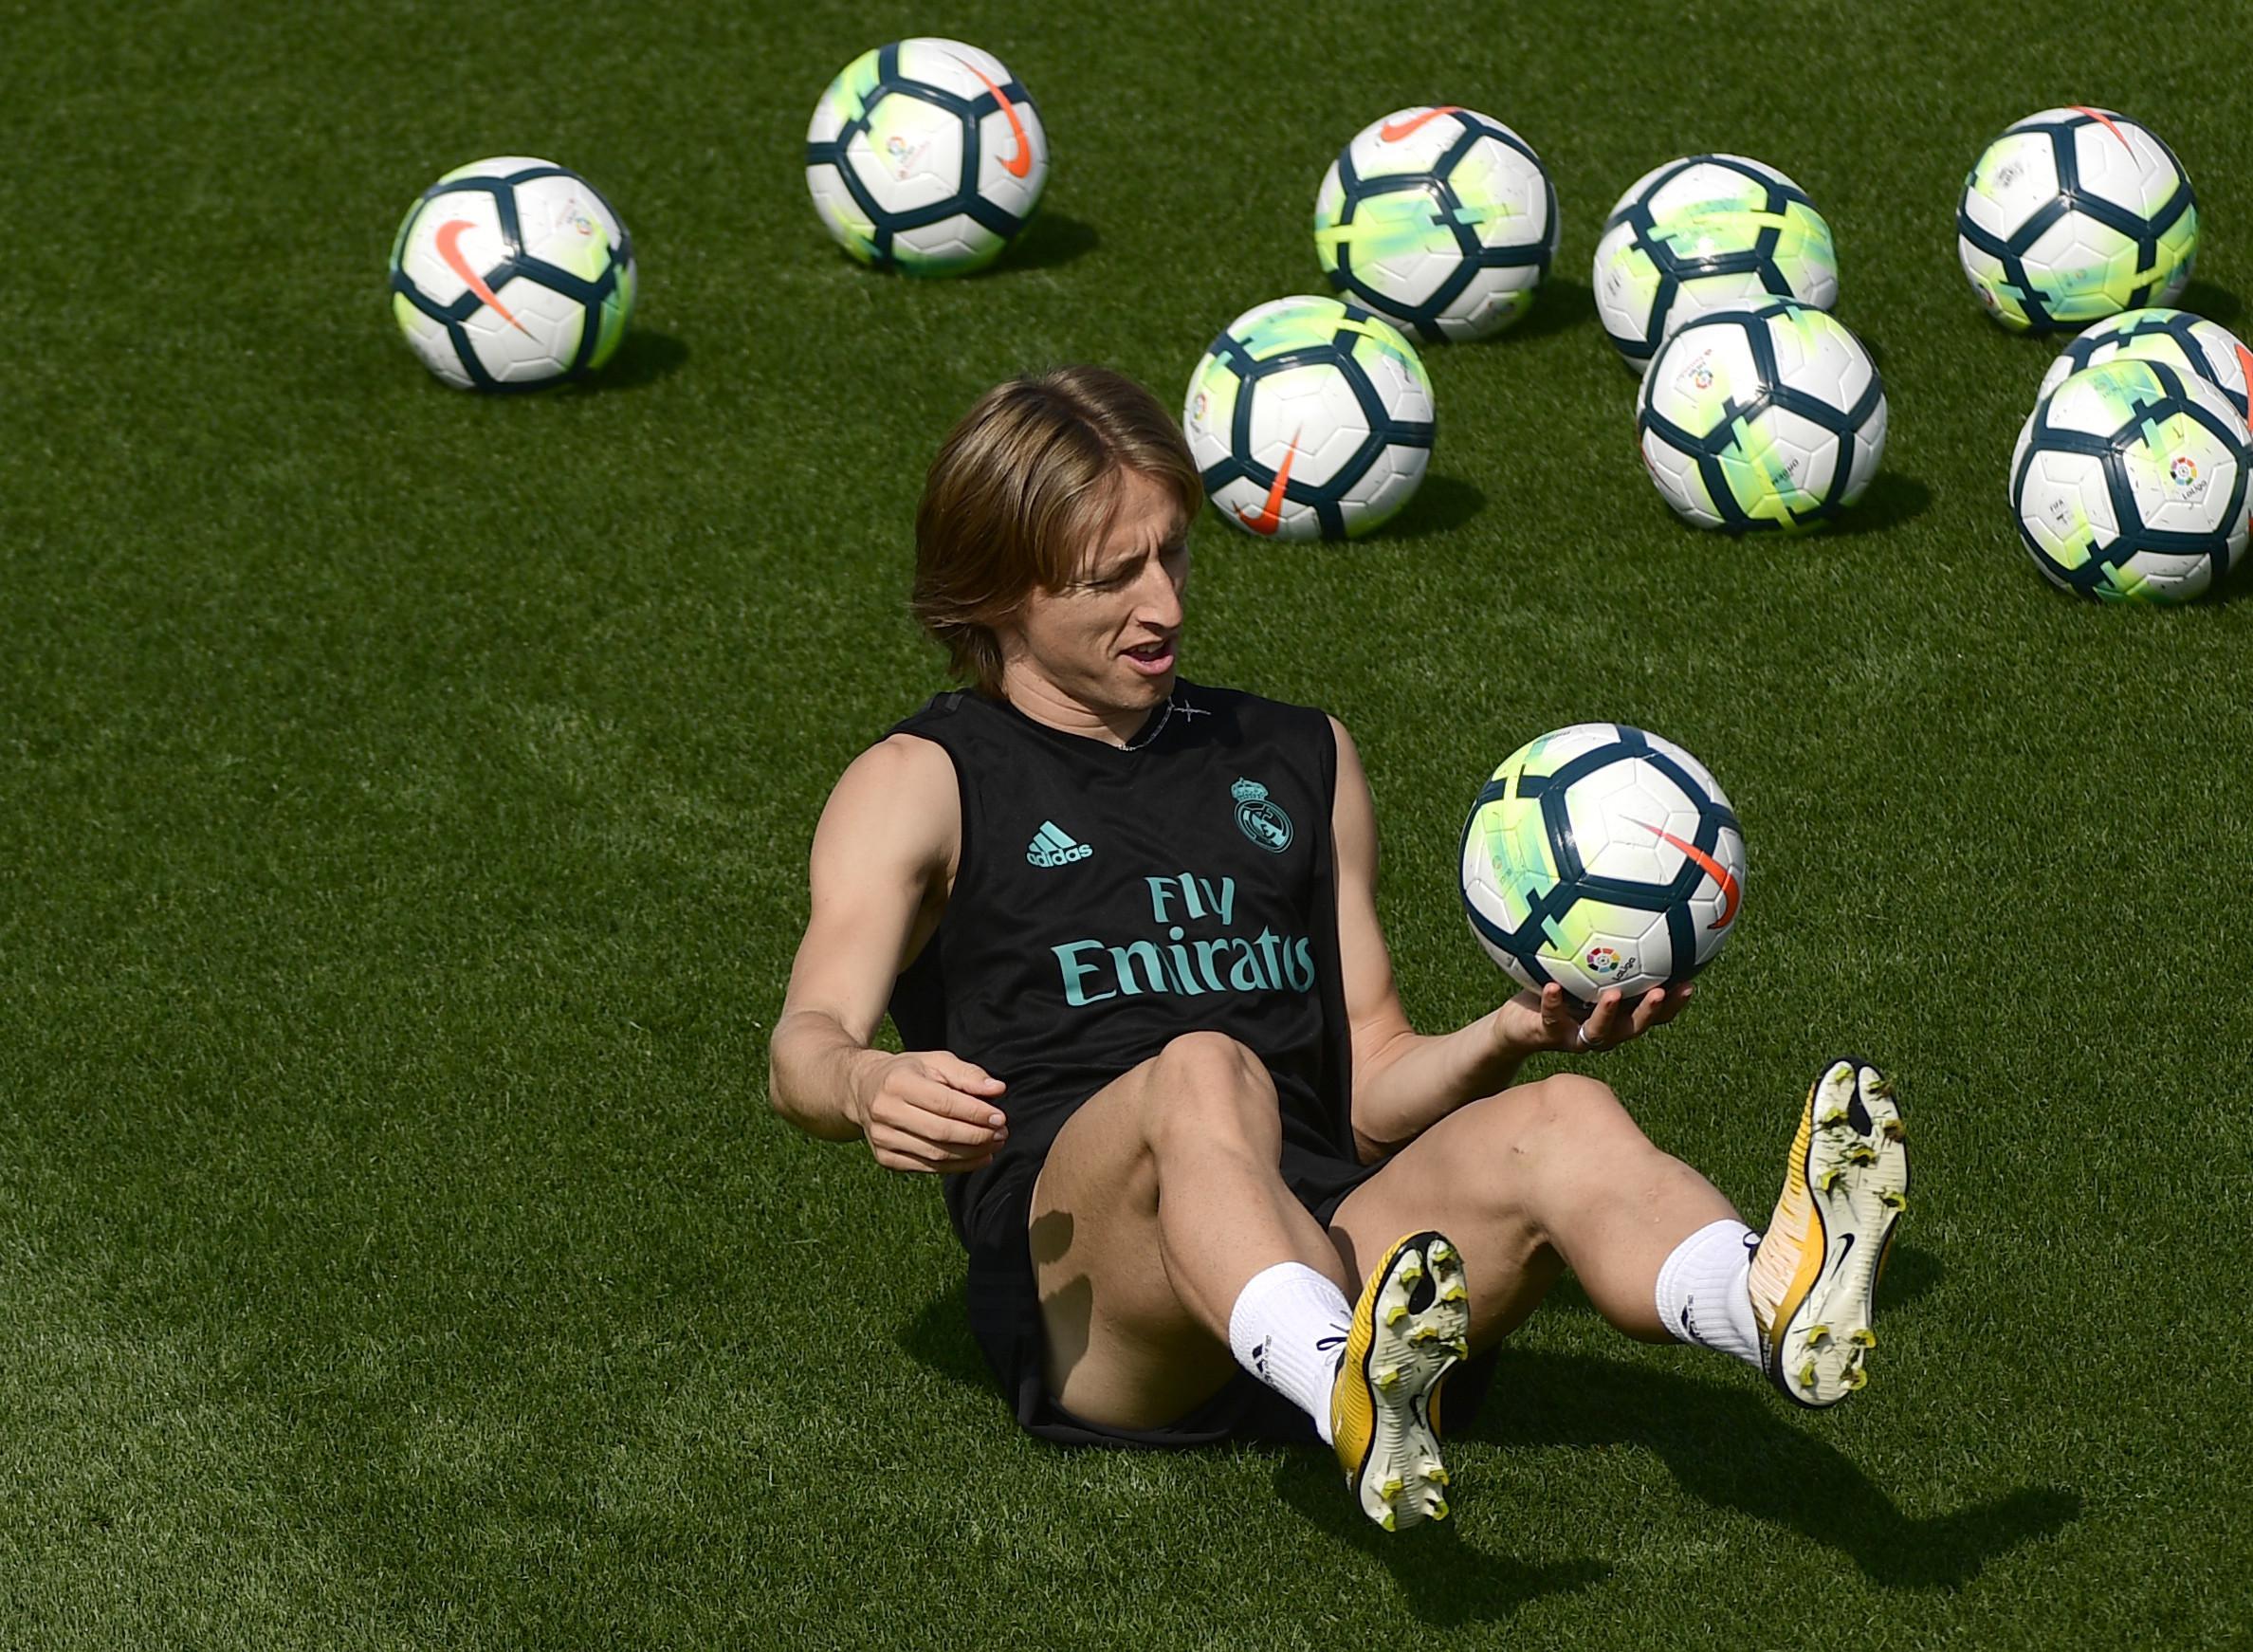 Gelandang Real Madrid Luka Modric. (AFP/Pierre-Philippe Marcou)